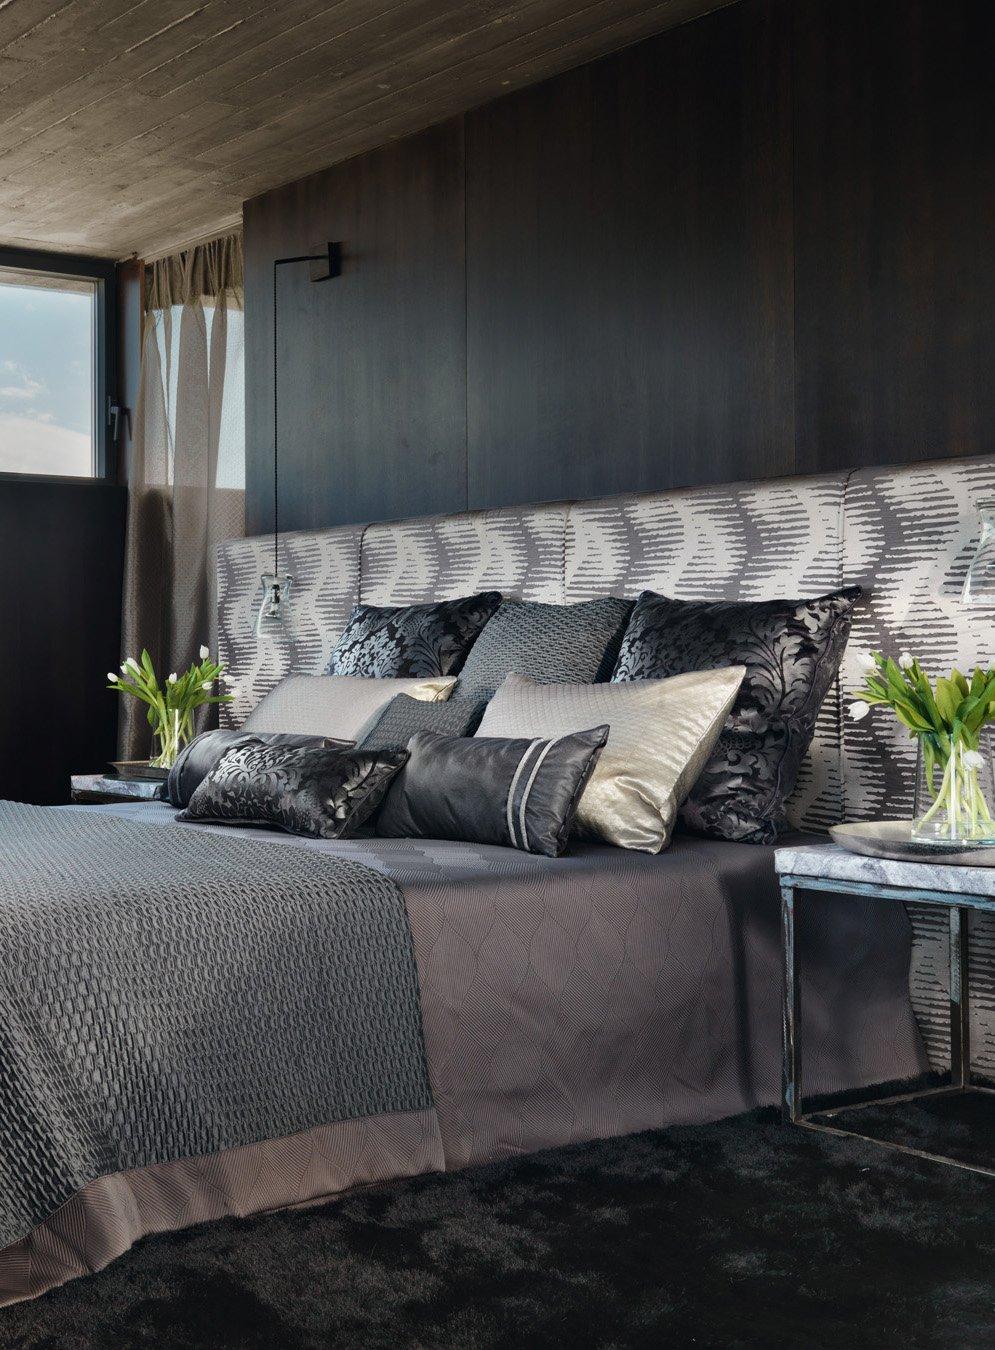 Bespoke soft furnishings in bedroom